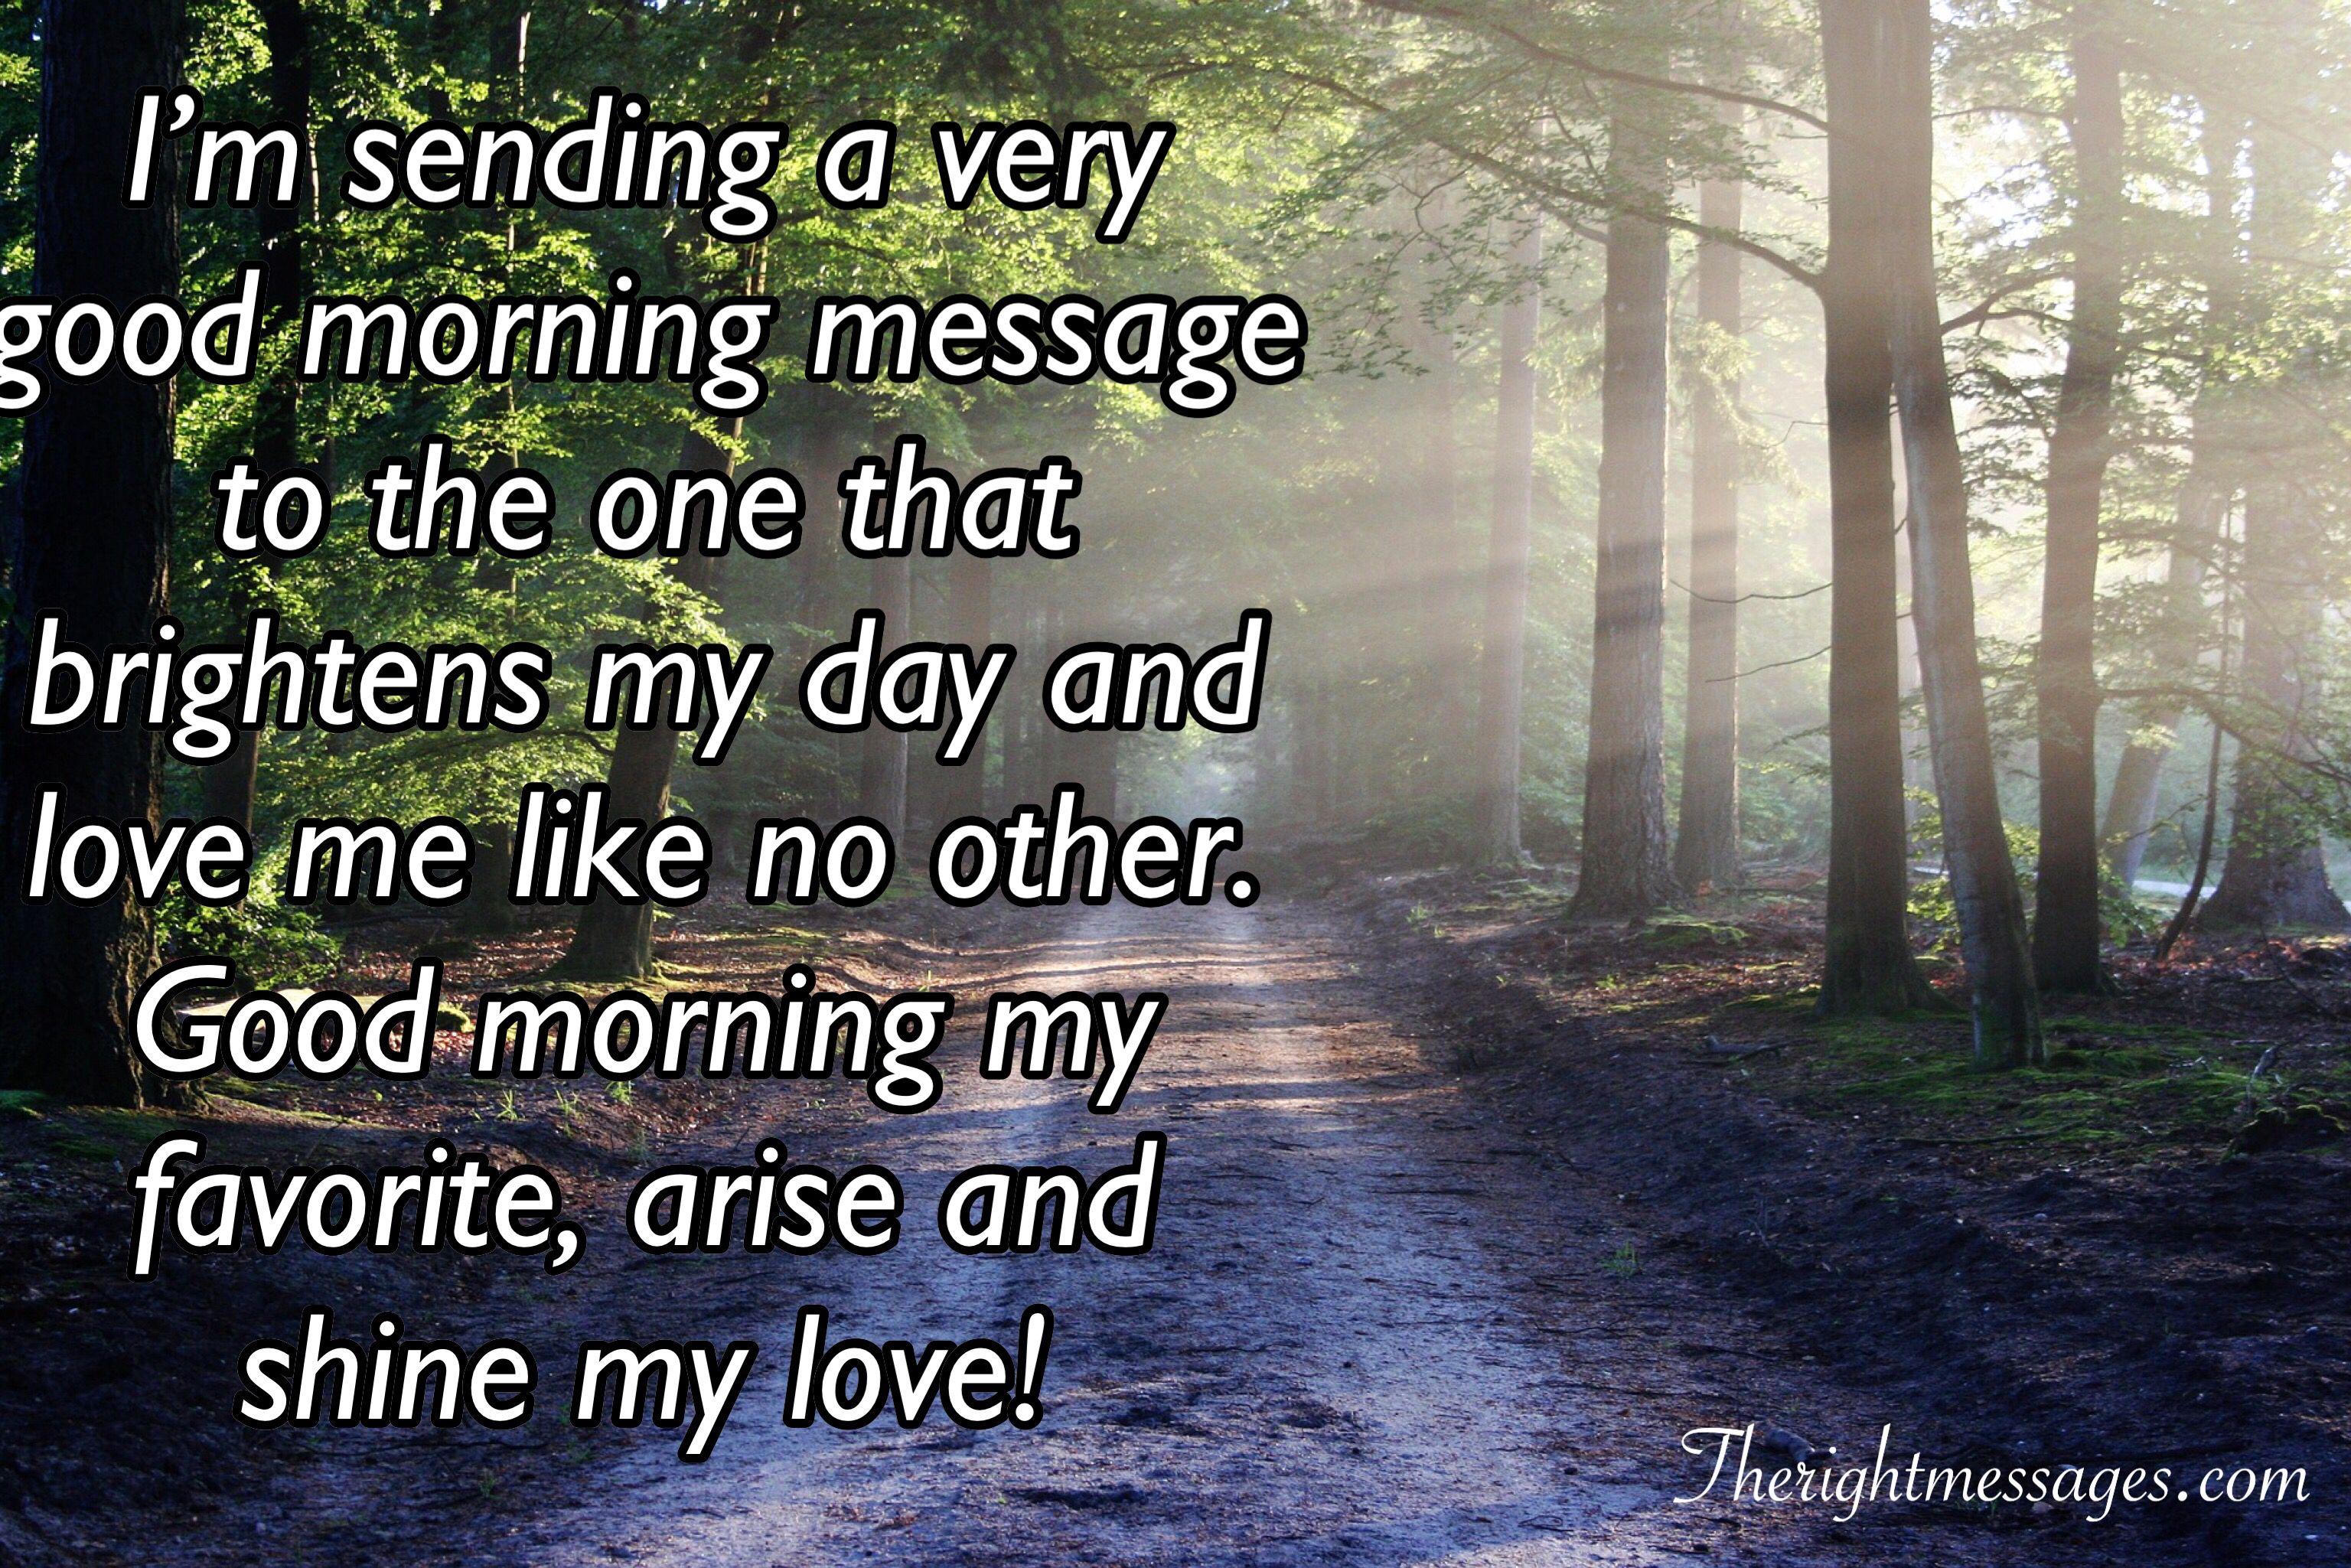 For sweet morning boyfriend text 40 Best